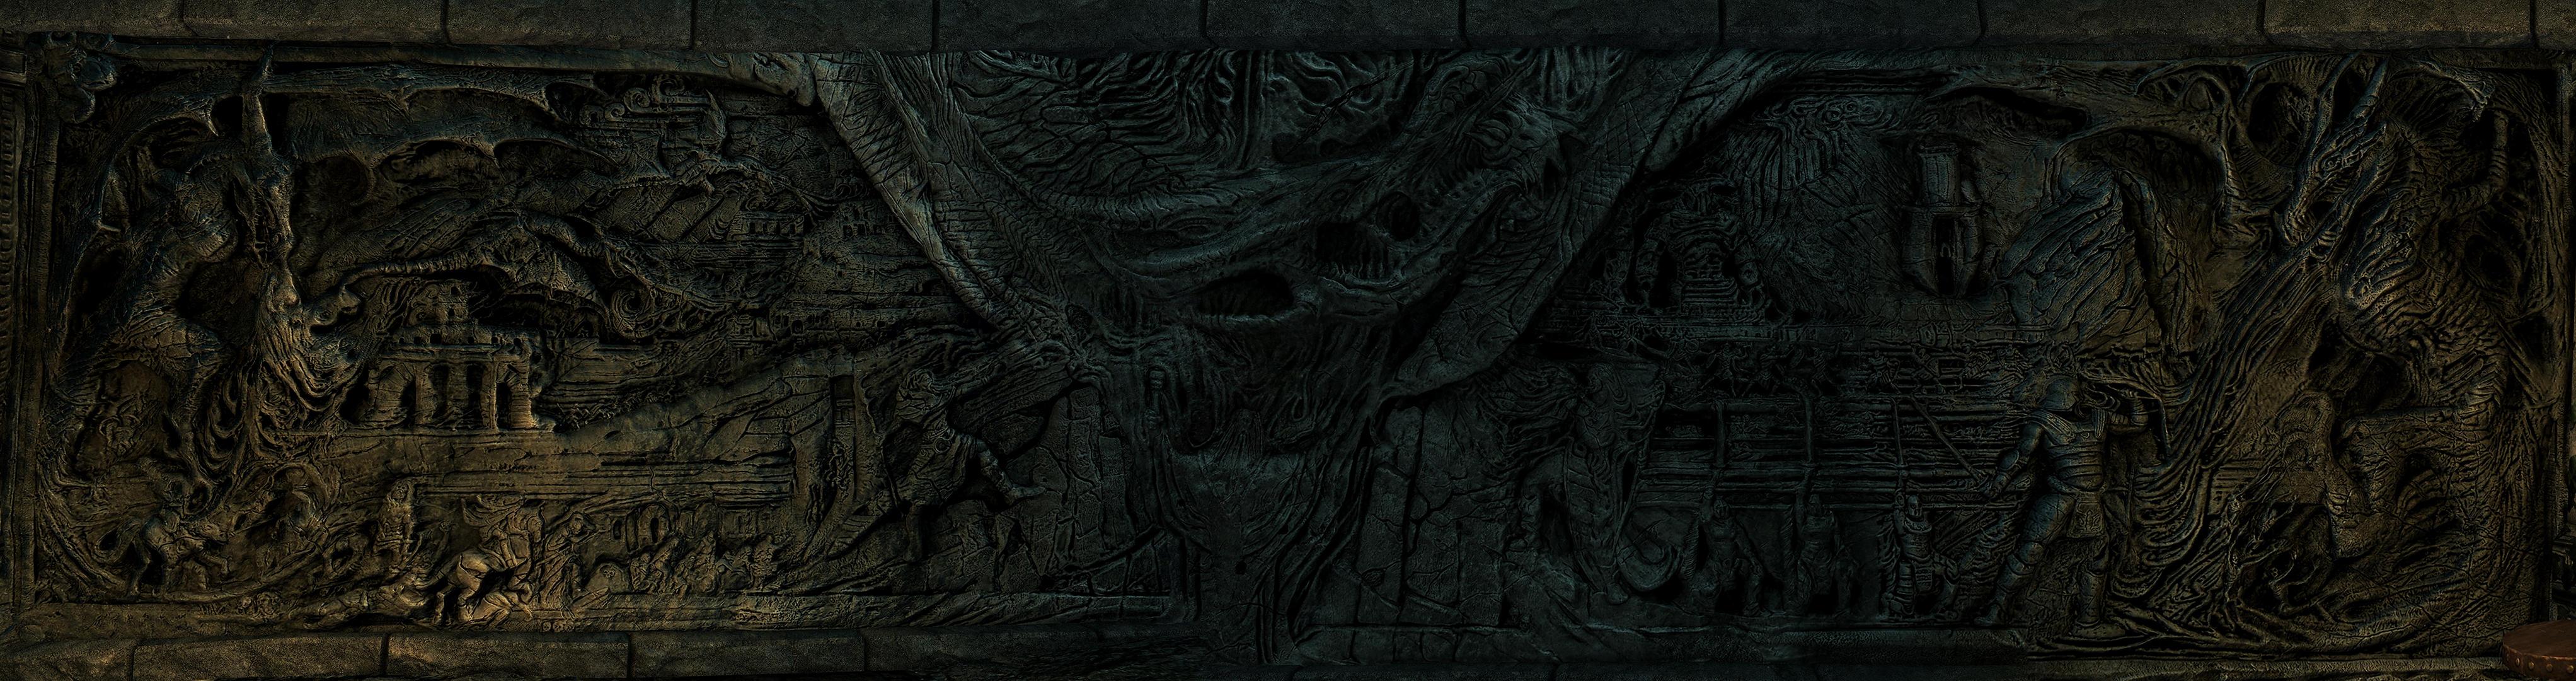 Wallpaper : bethesda, pano, panorama, the, elder, scrolls, V